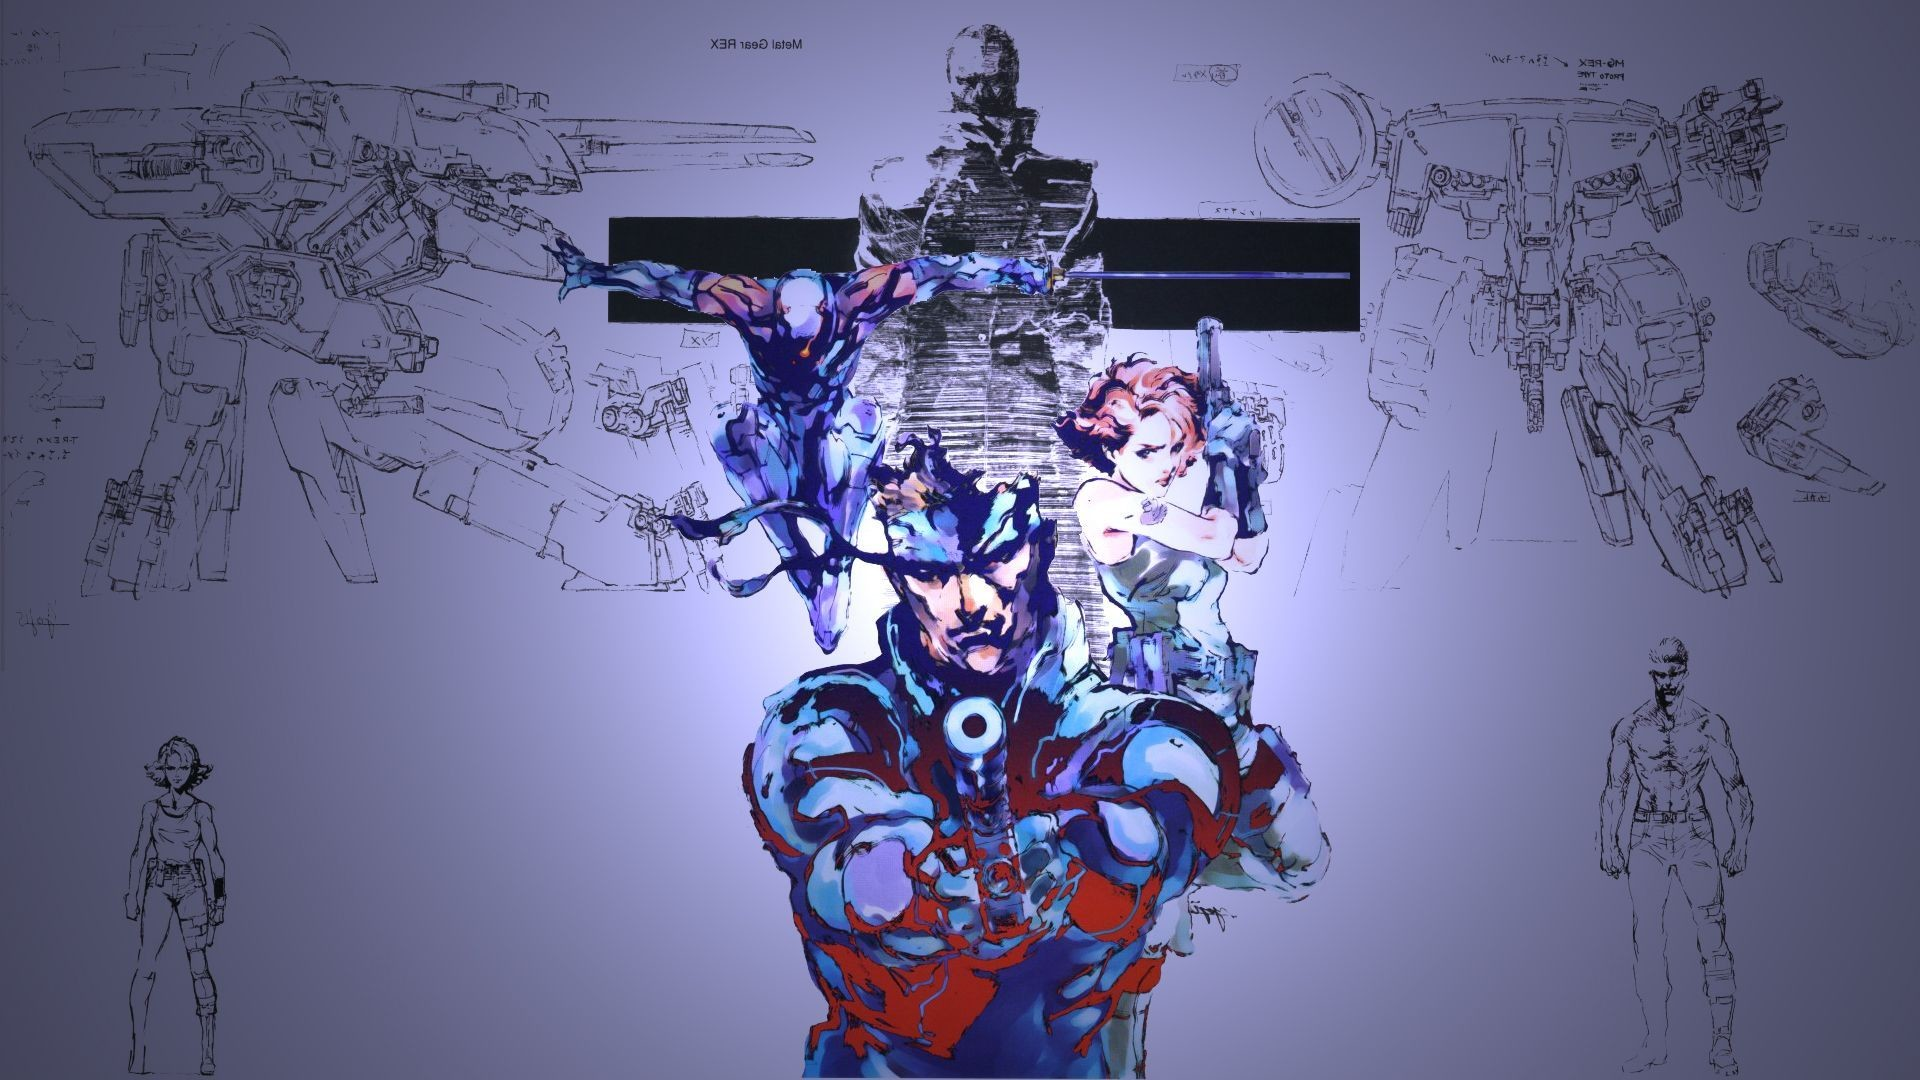 Metal Gear Solid HD Wallpaper 1920×1080